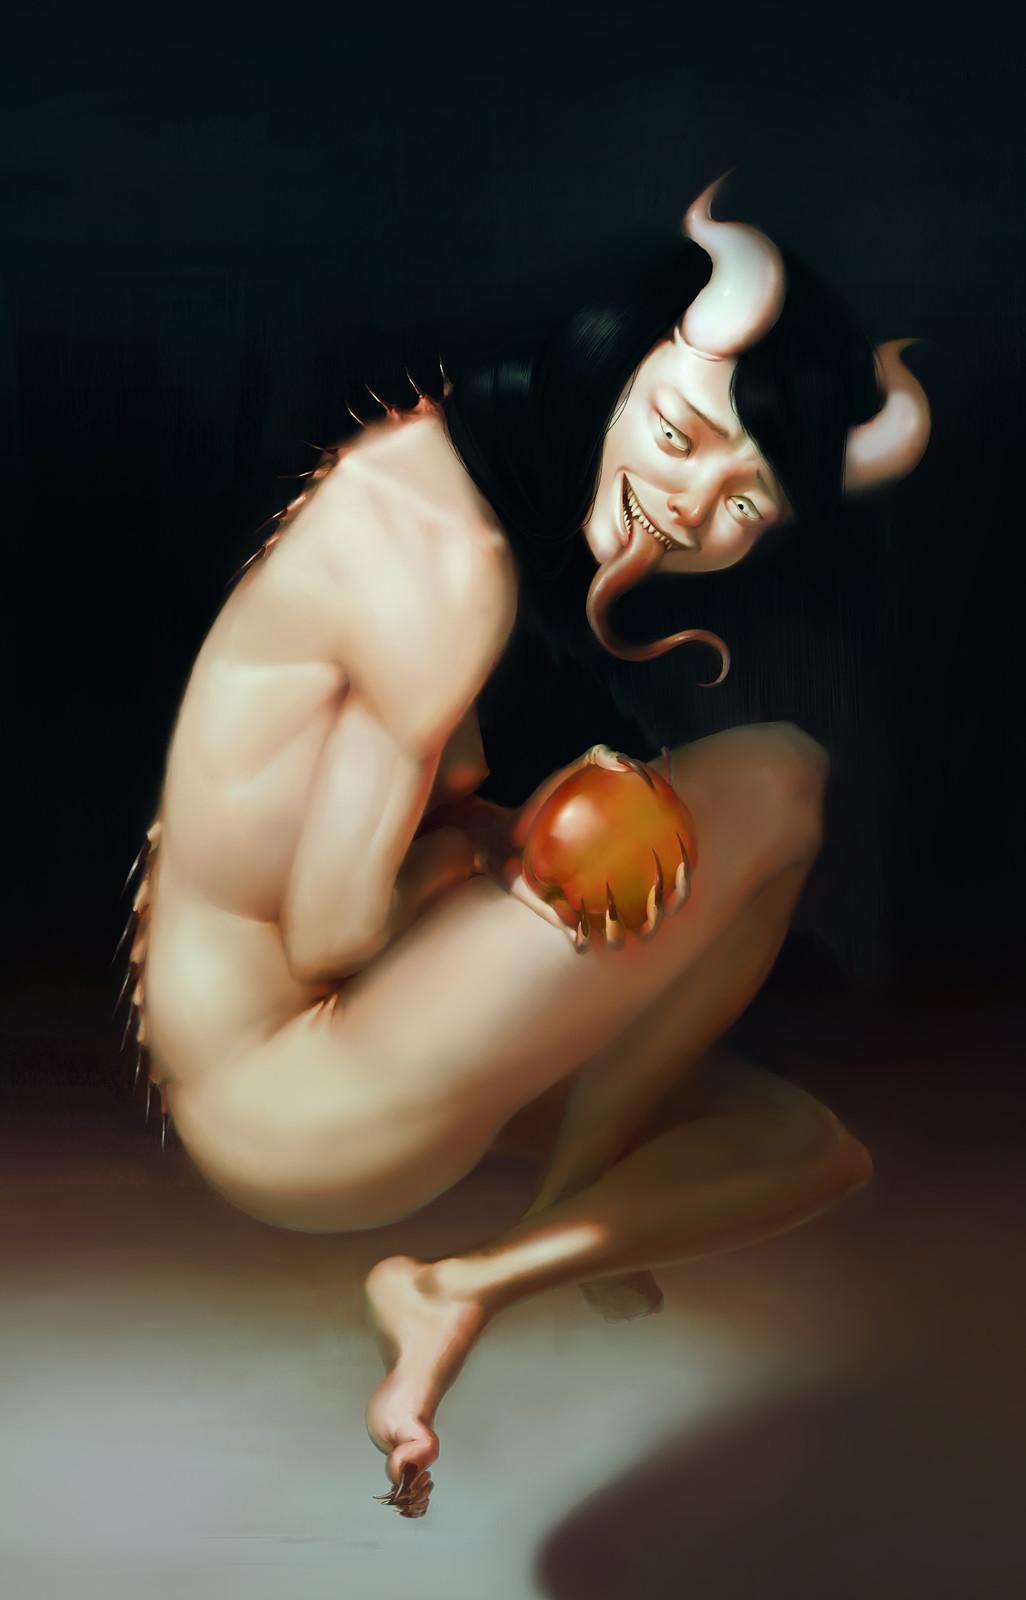 Demon Girls: Apple Demon